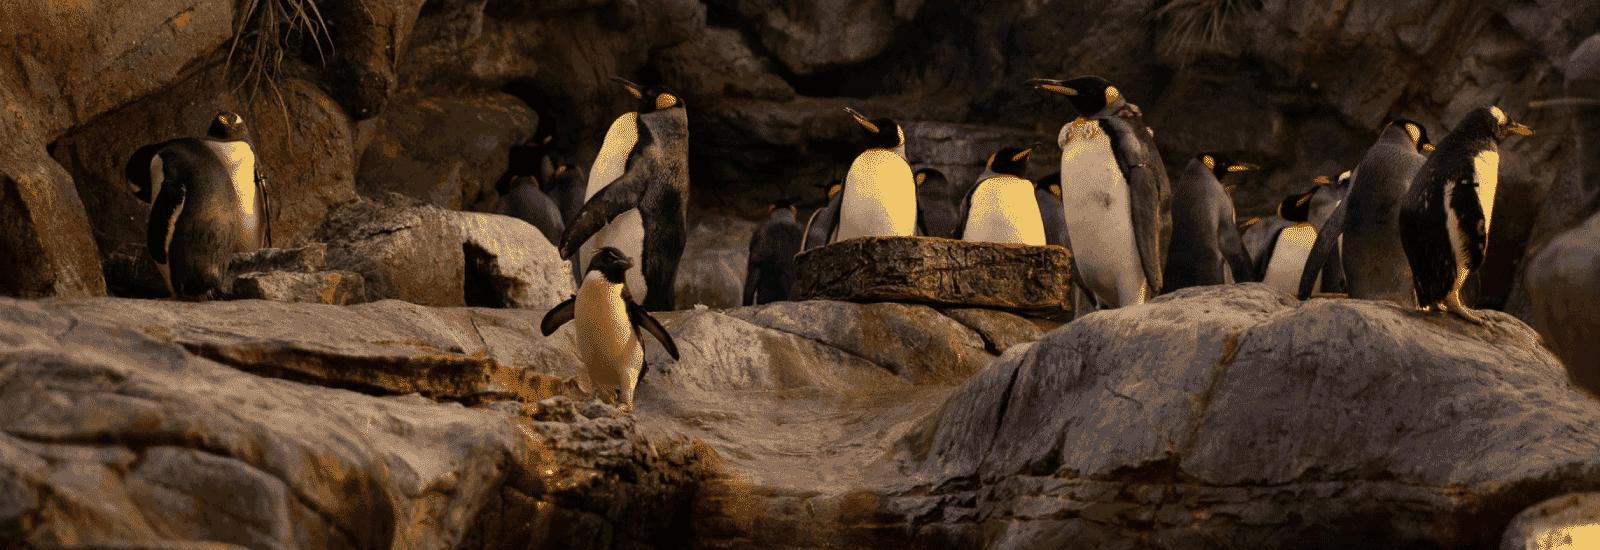 St. Louis Zoo, MO